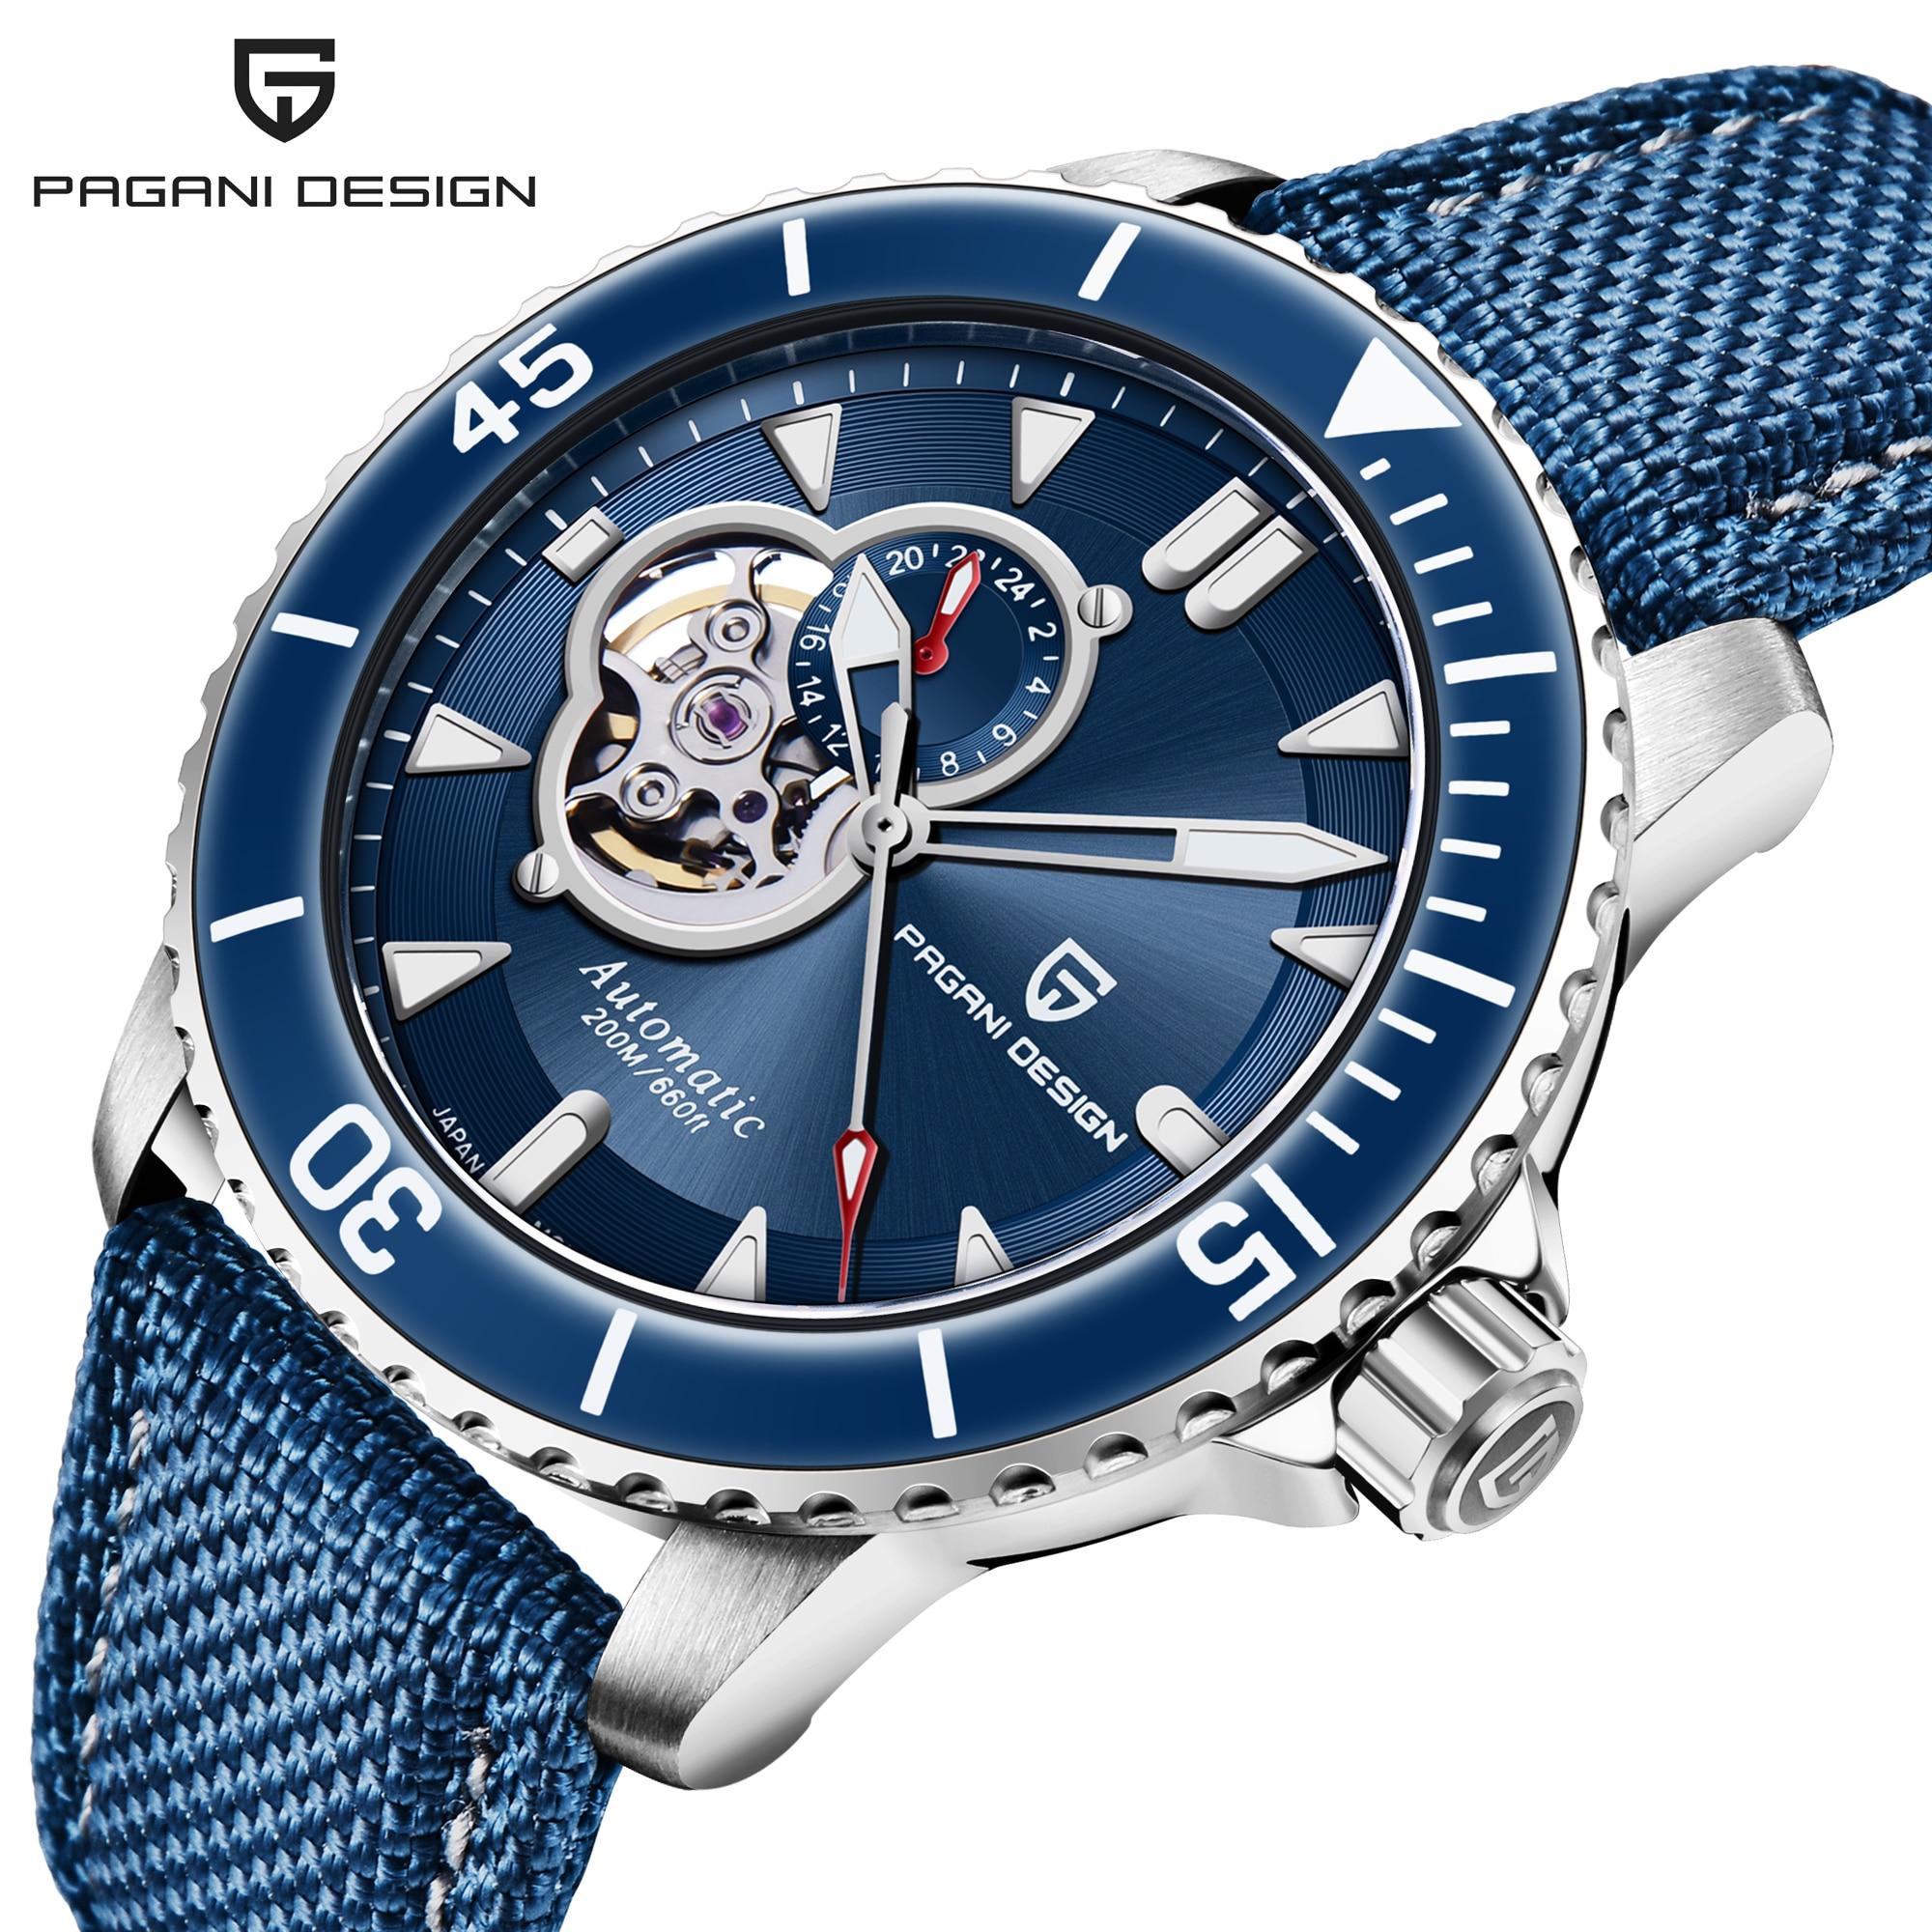 2021 PAGANI DESIGN New 200m Waterproof Automatic Mechanical Clock Leather Men's Sports Sapphire Watch Reloj Hombre